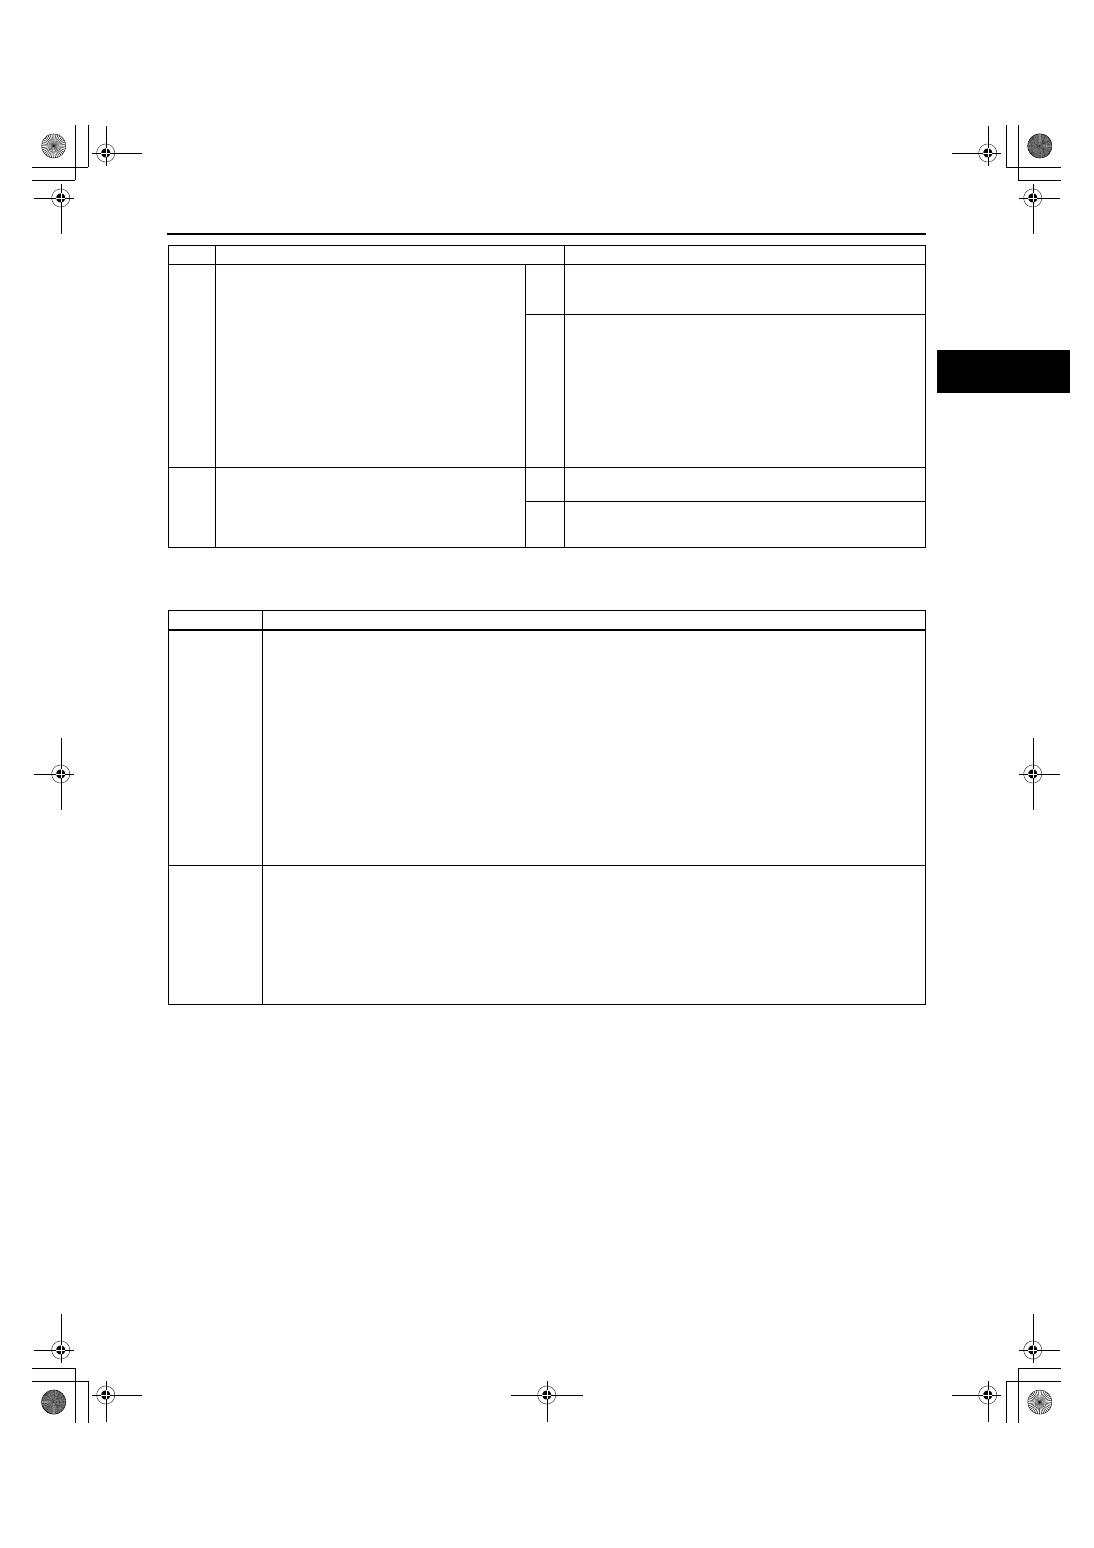 mazda cx 7 manual part 32 rh zinref ru Branch Circuit Wiring Electrical Wiring Diagrams For Dummies